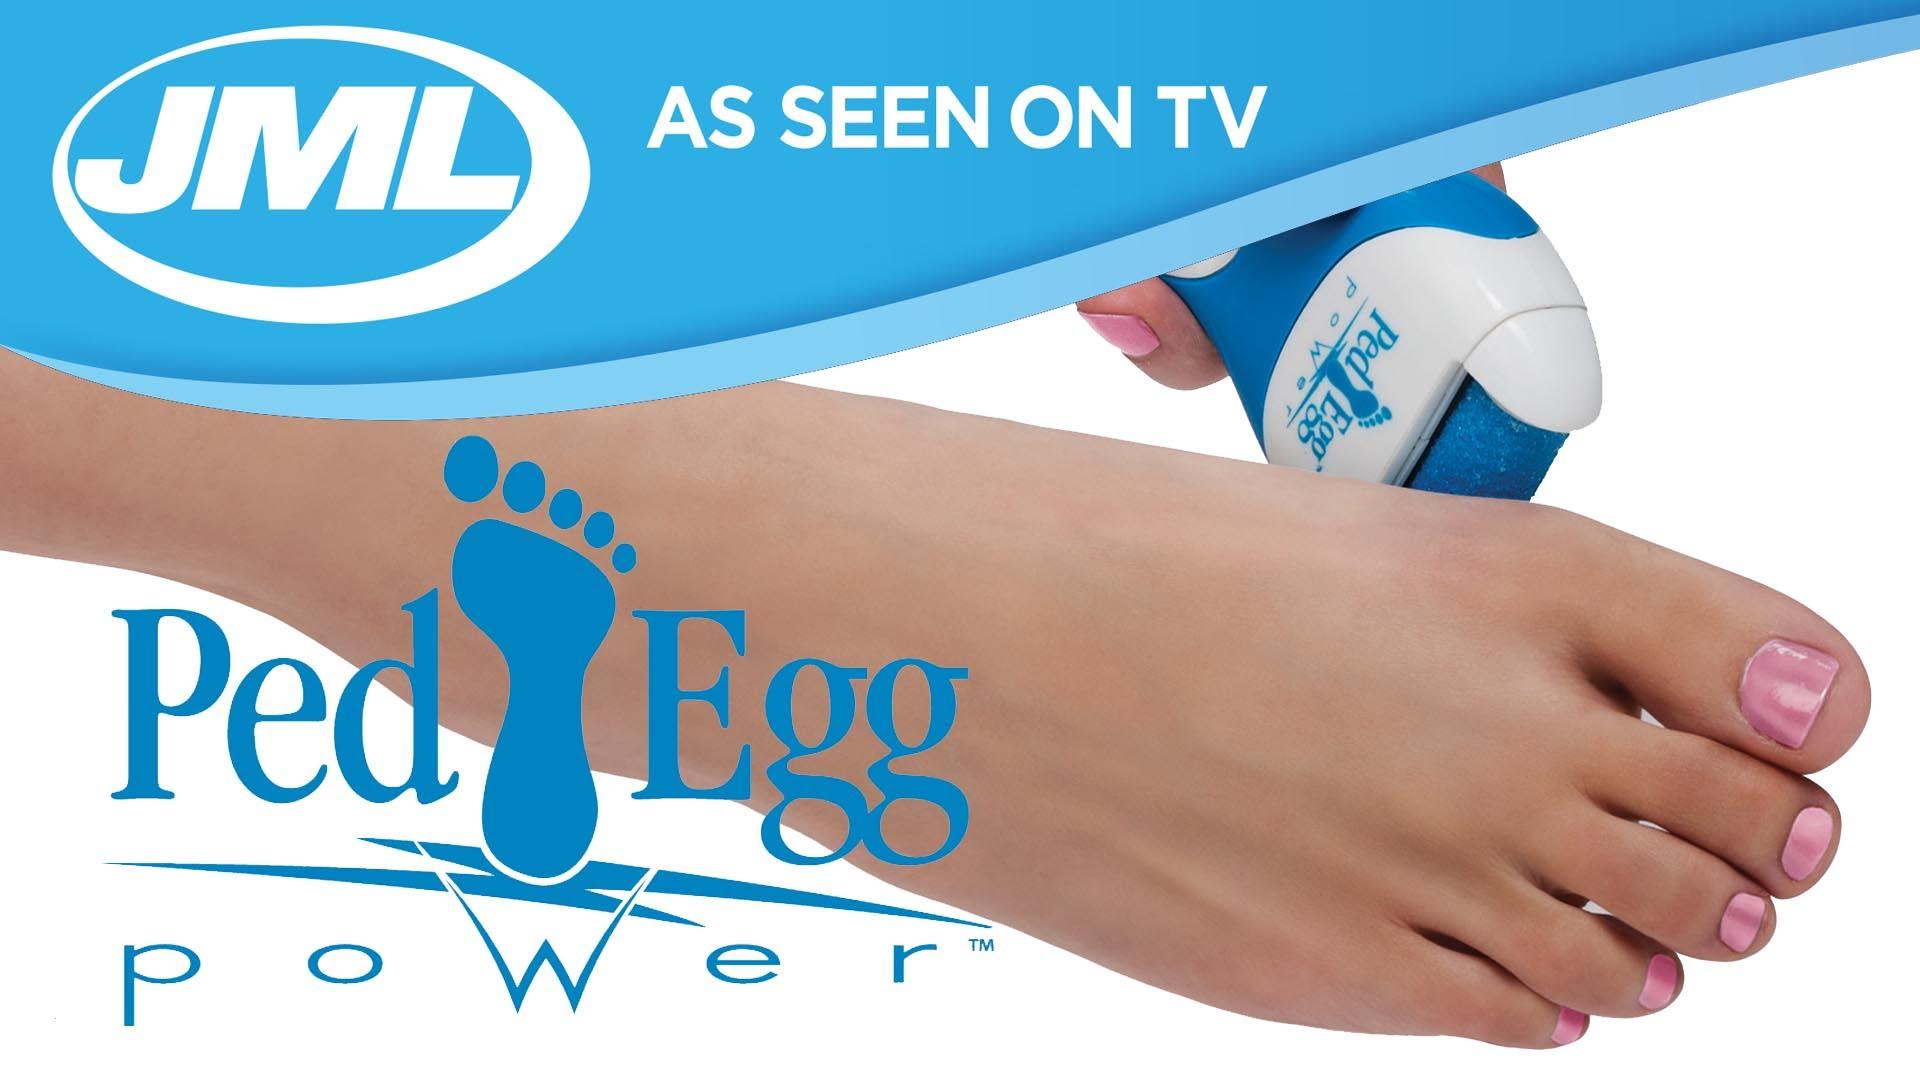 Картинки по запросу Пилка для огрубевшей кожи ног Ped Egg Powerball